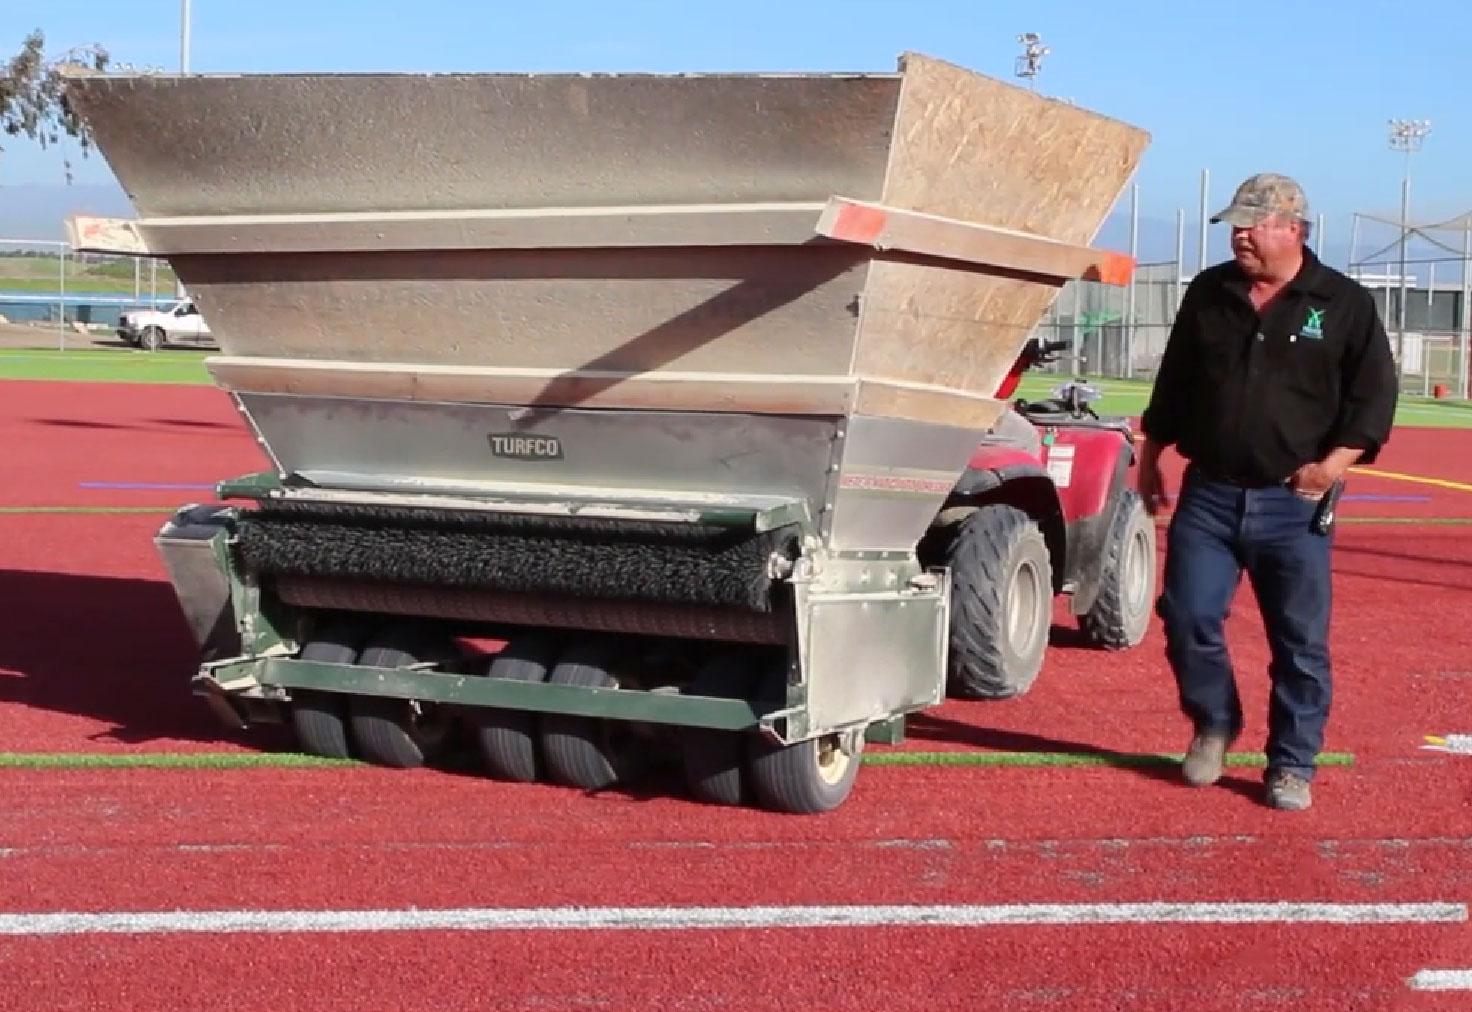 Sports complex red artificial grass